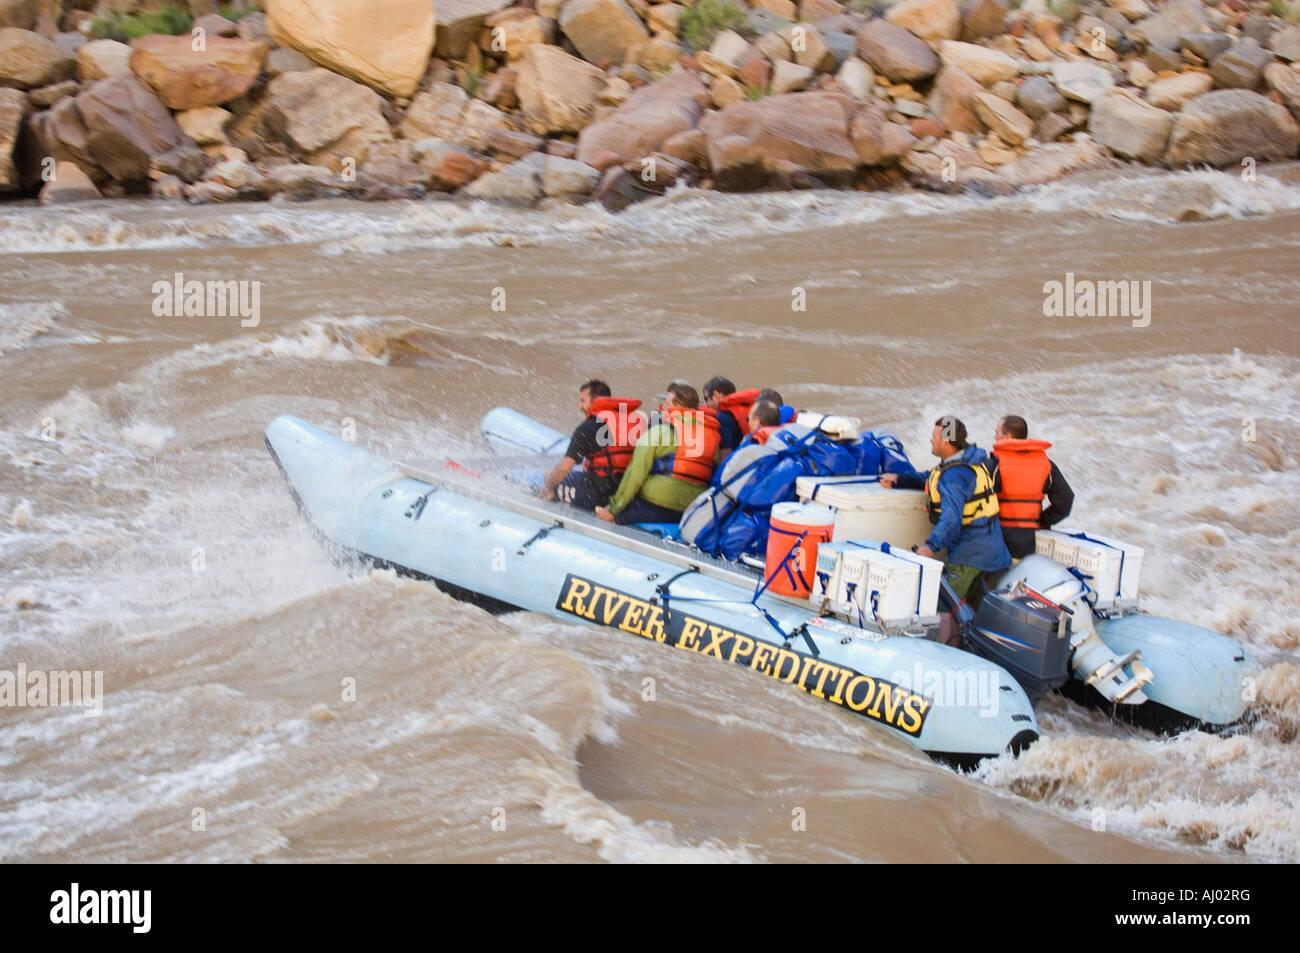 People on white water rafting tour, Colorado River, Moab, Utah, United States - Stock Image